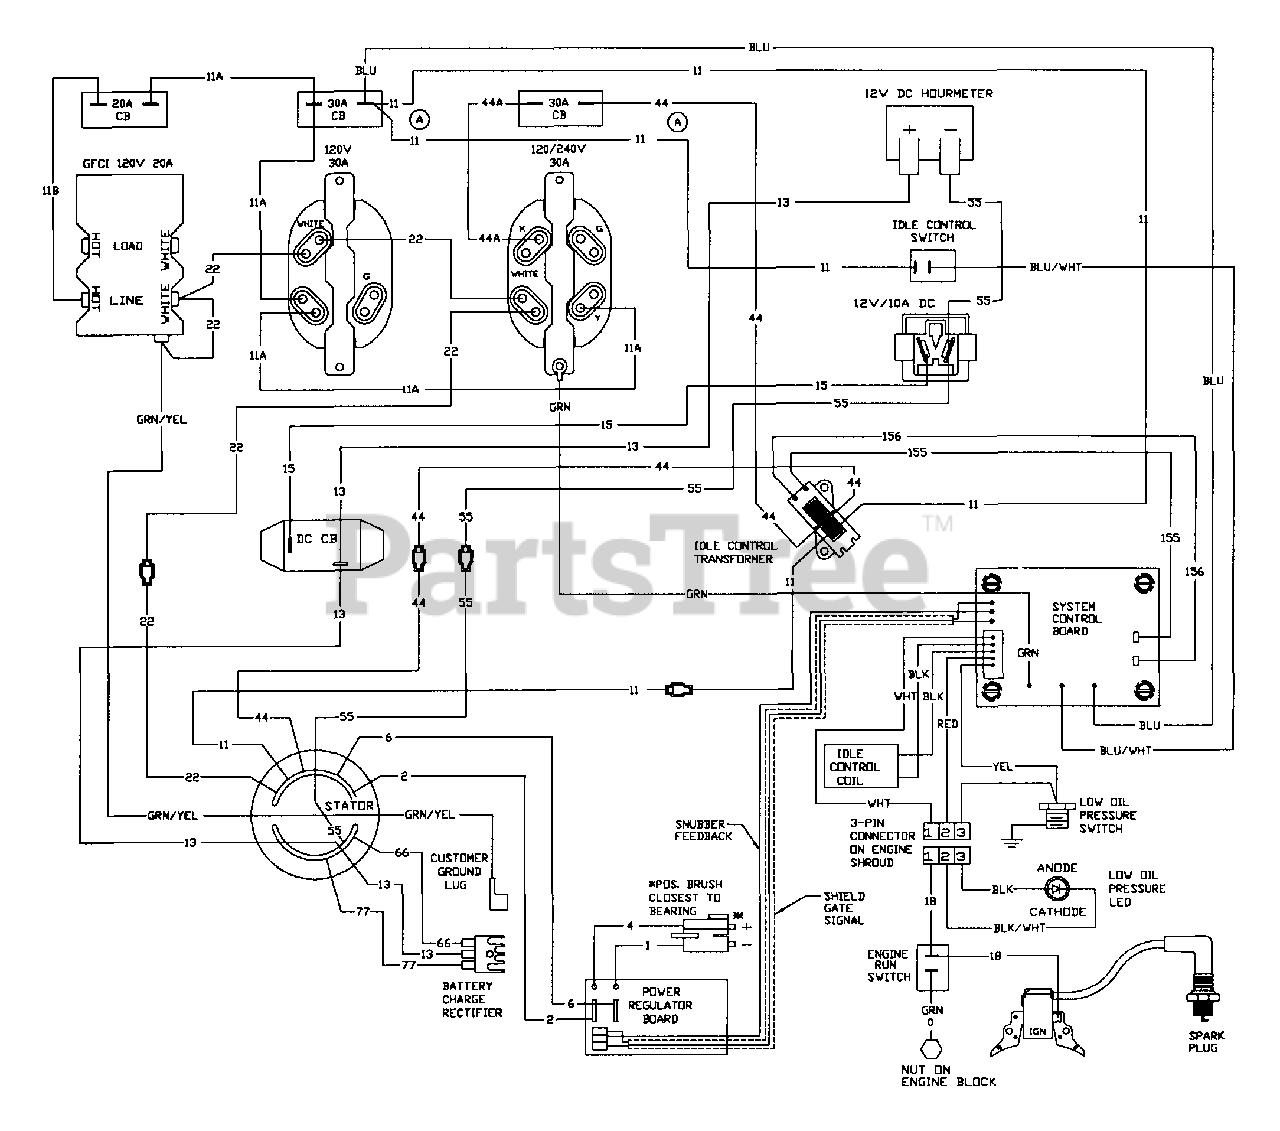 Generac 1006-1 - Generac MEGAFORCE 6,500 Watt Portable Generator Wiring  Diagram Parts Lookup with Diagrams | PartsTreePartsTree